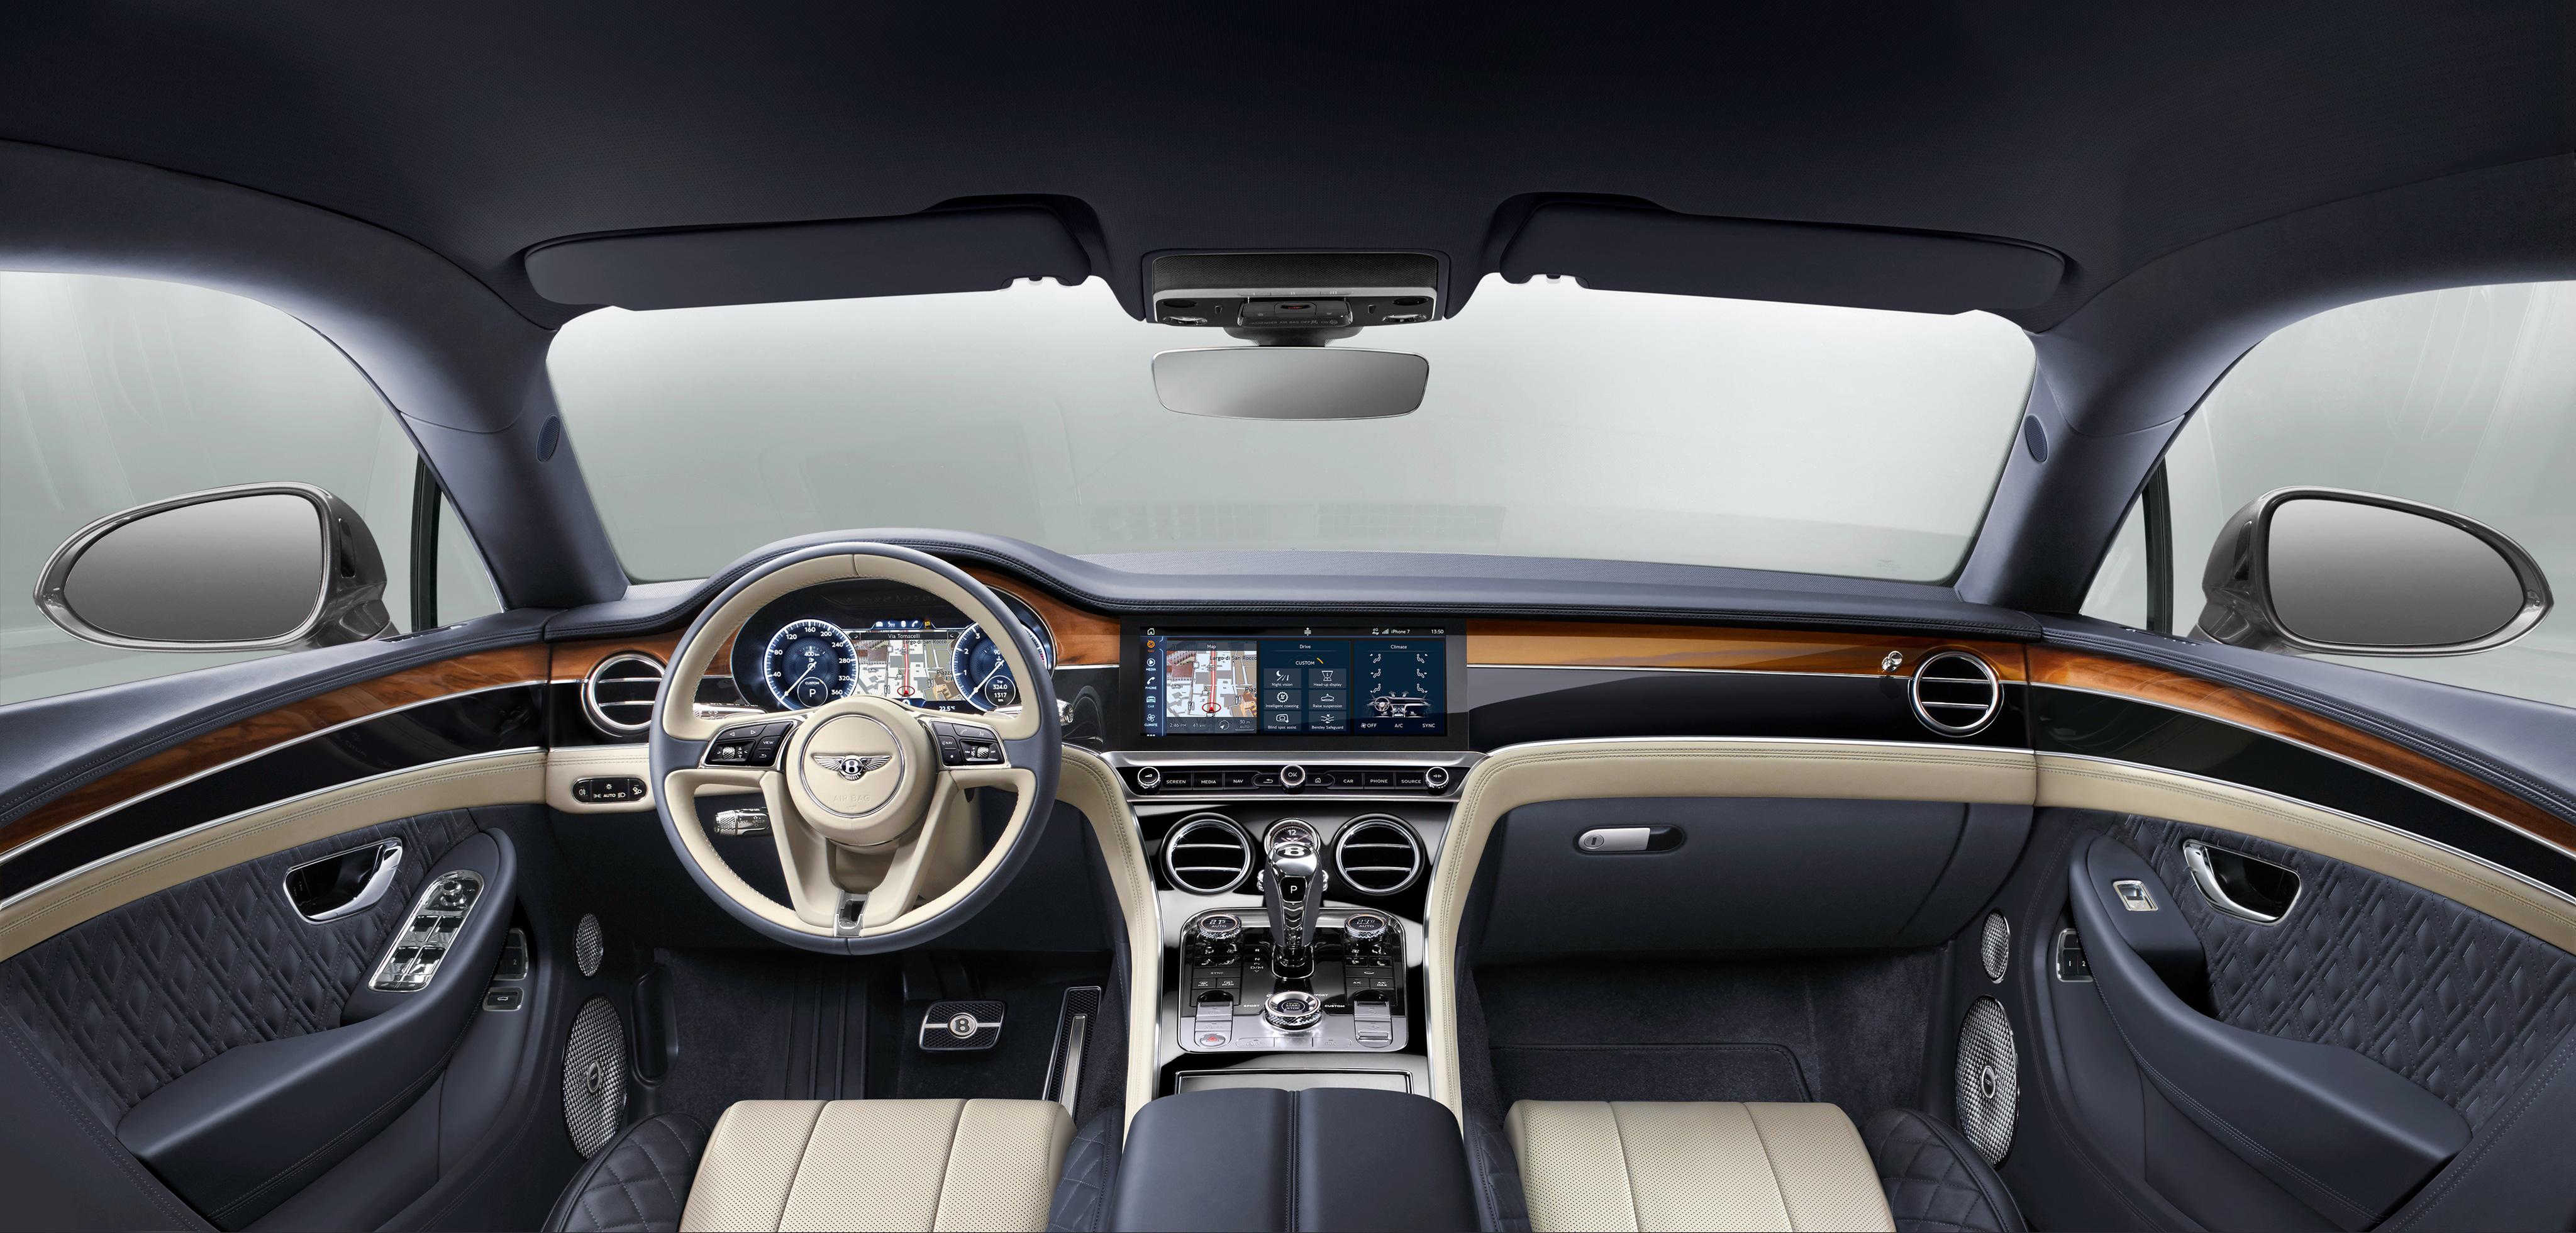 Bentley Continental GT 2017 Interior, HD Cars, 4k ...